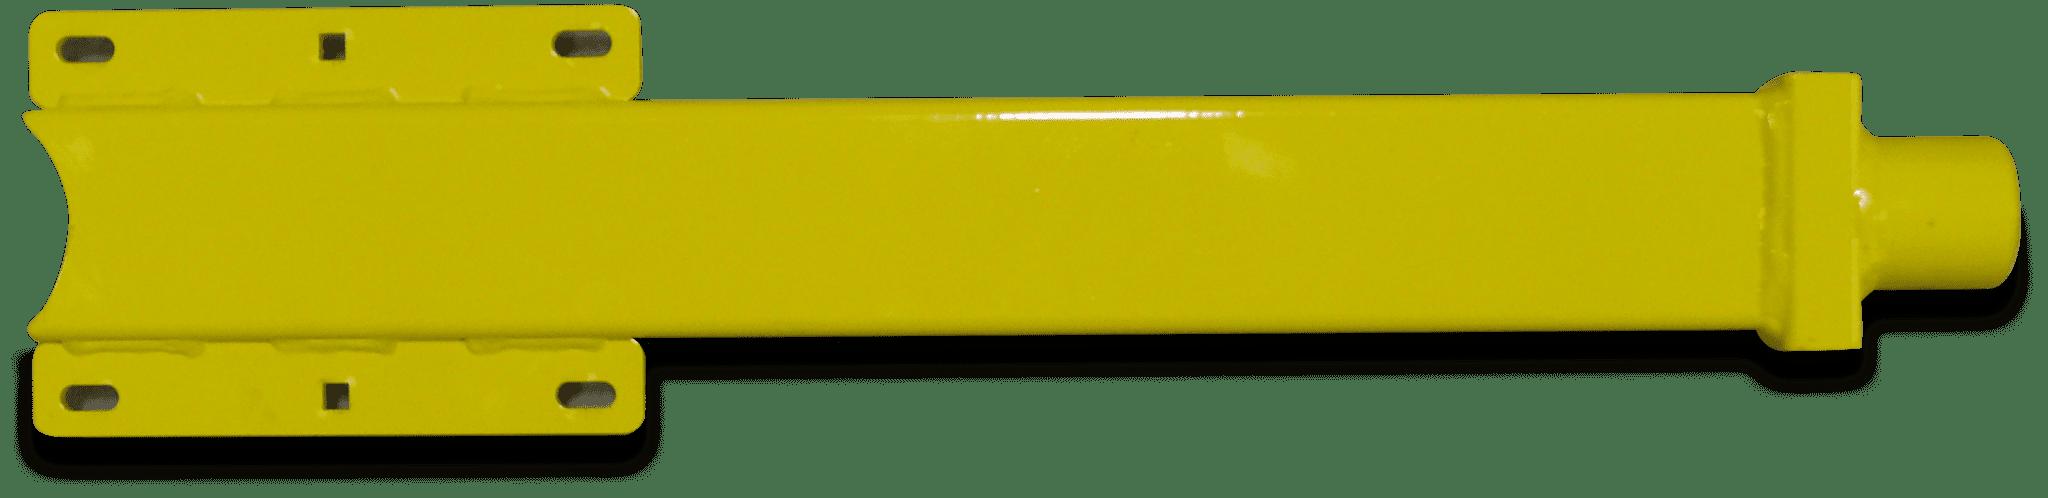 The yellow Gondola Train Splined Lift Arm.